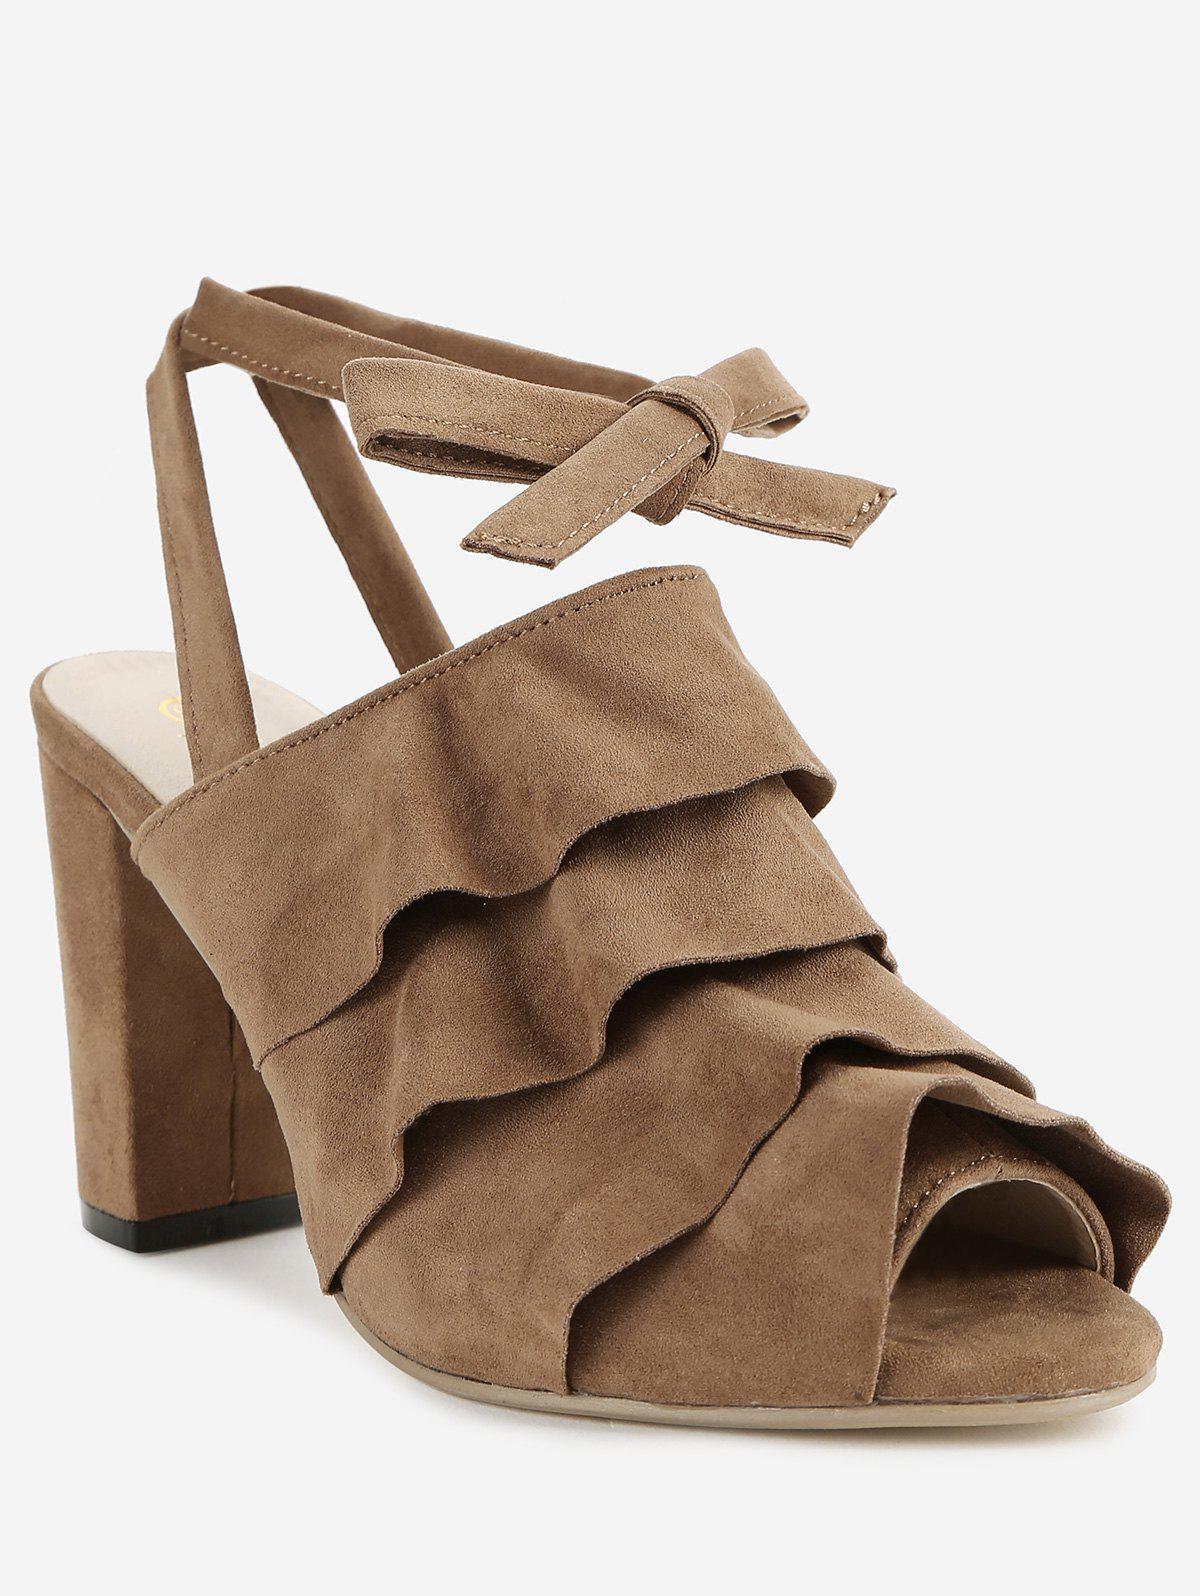 Ankle Strap Chunky Heel Ruffles Peep Toe Sandals